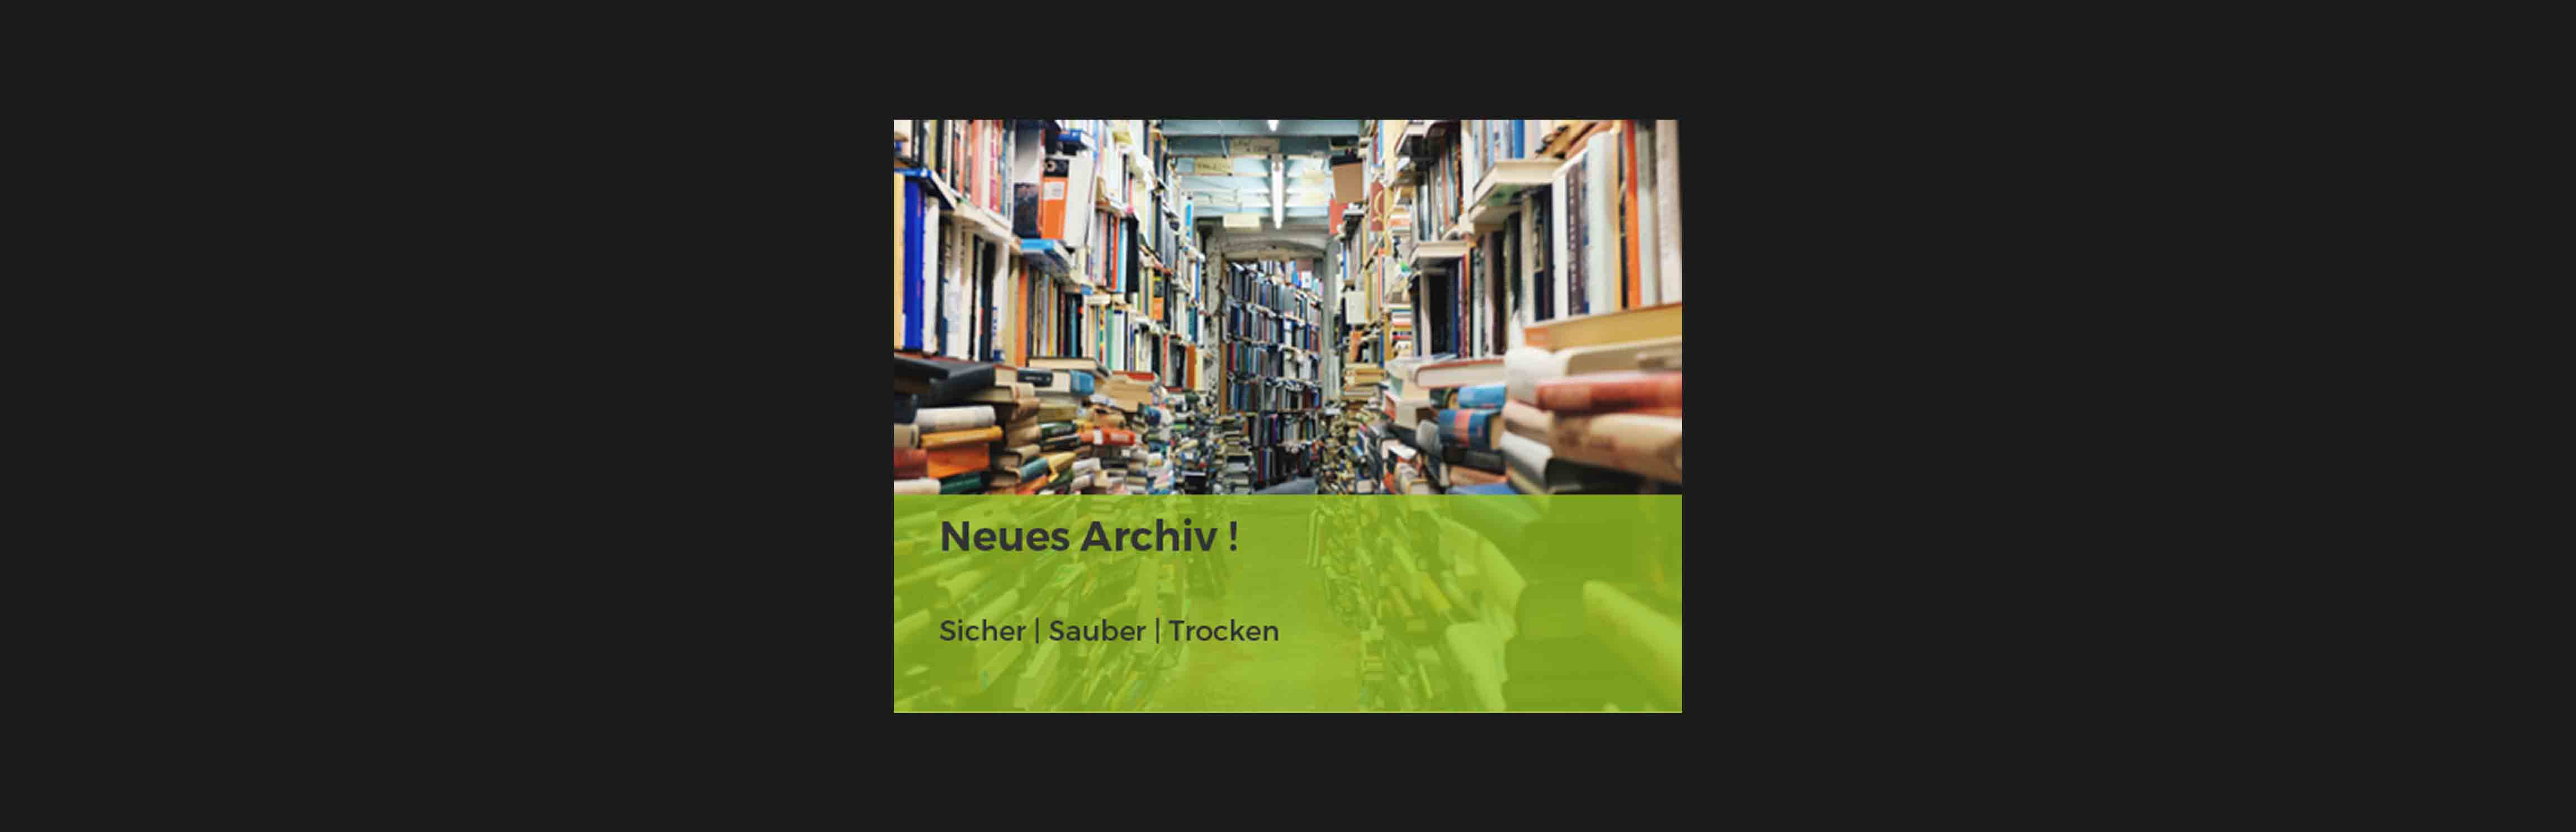 Angebots-Slider Archiv